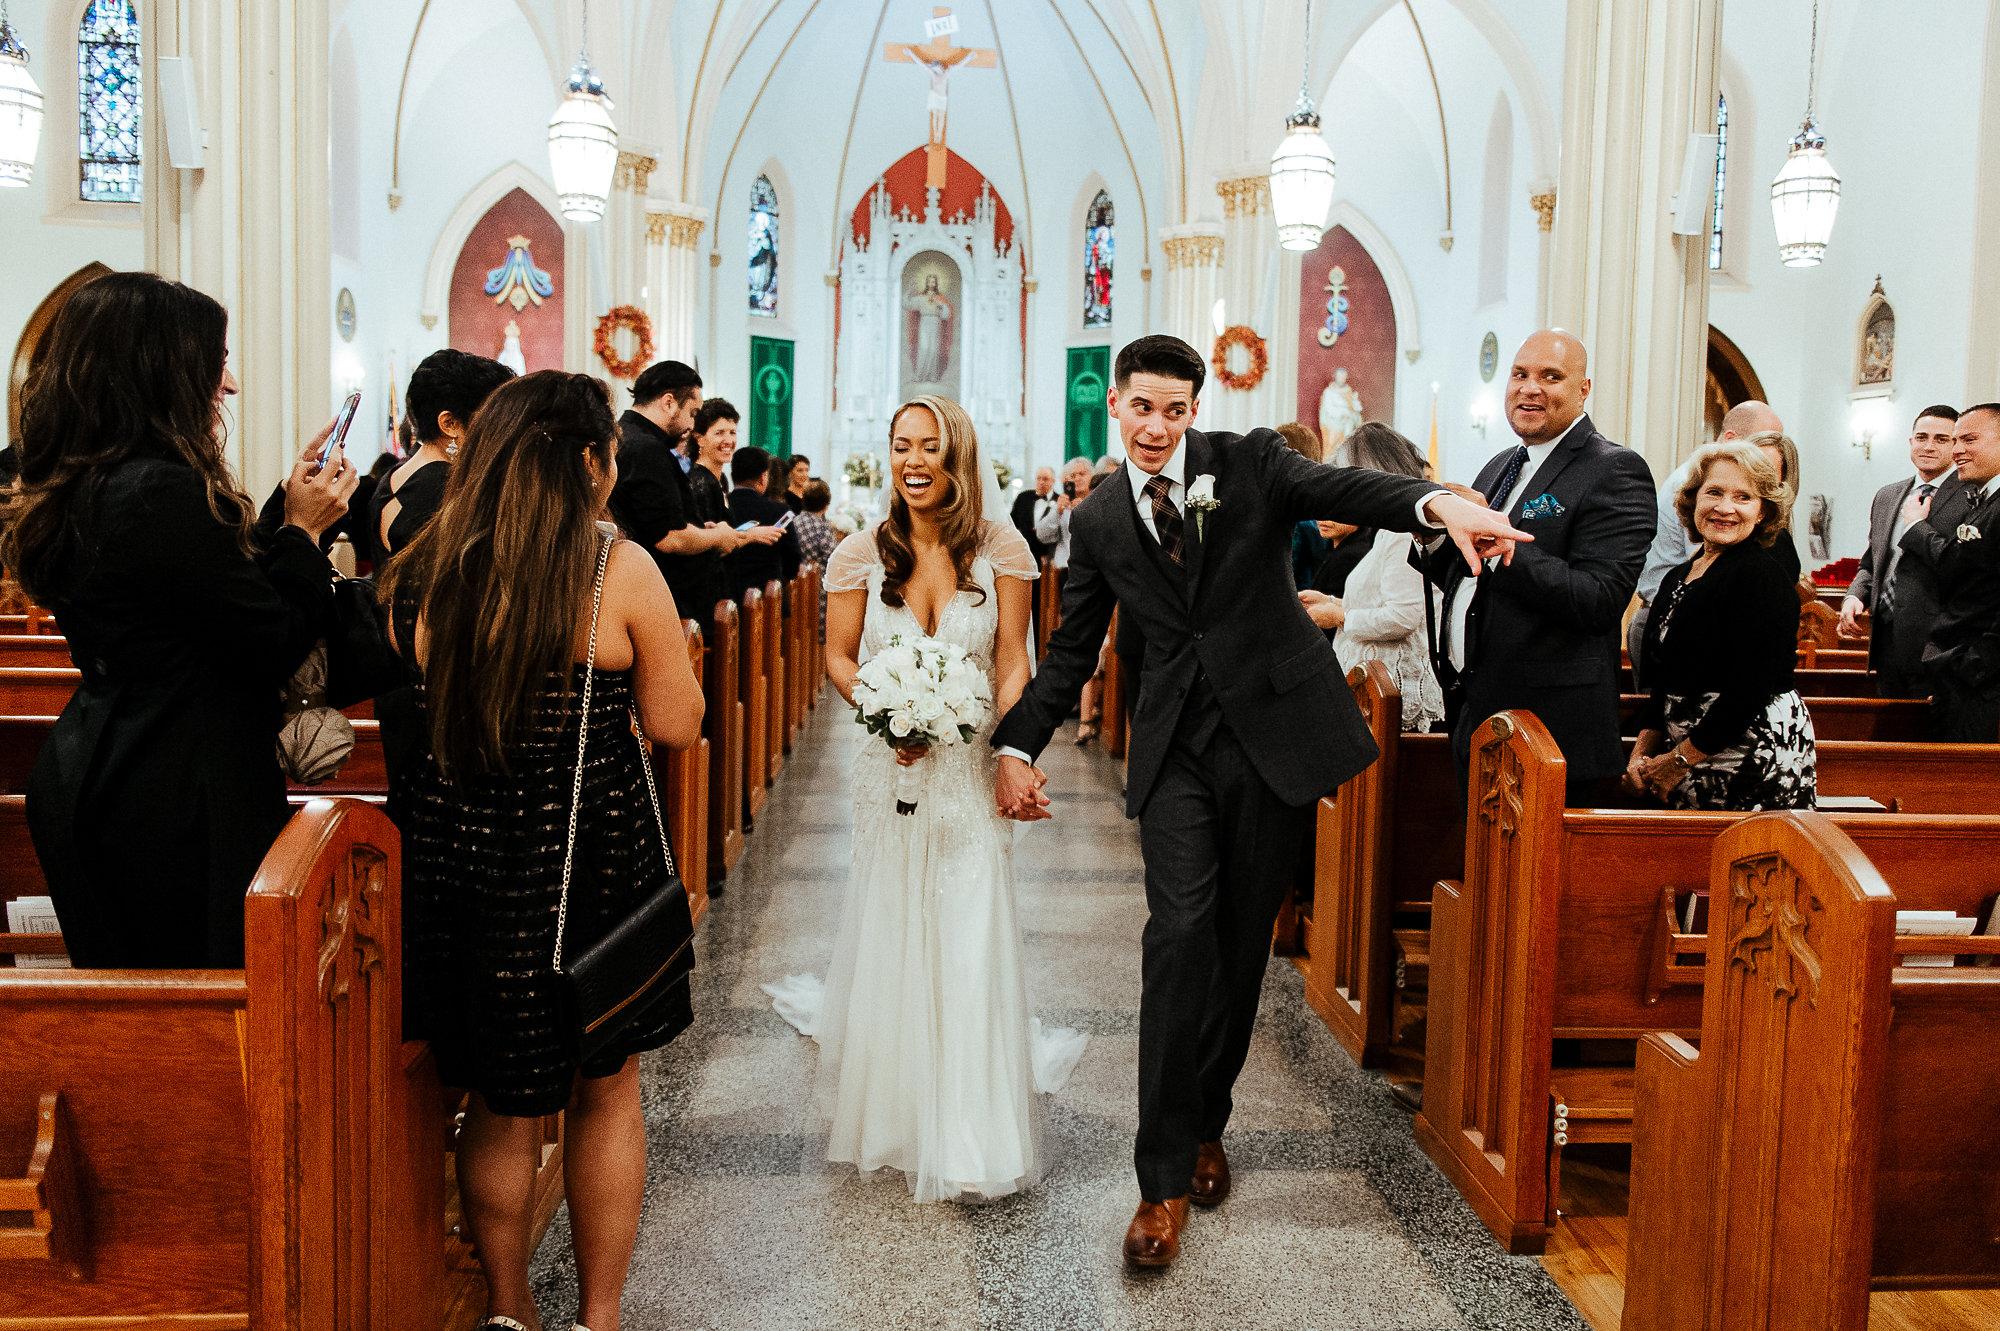 wedding_prep_ceremony8.JPG